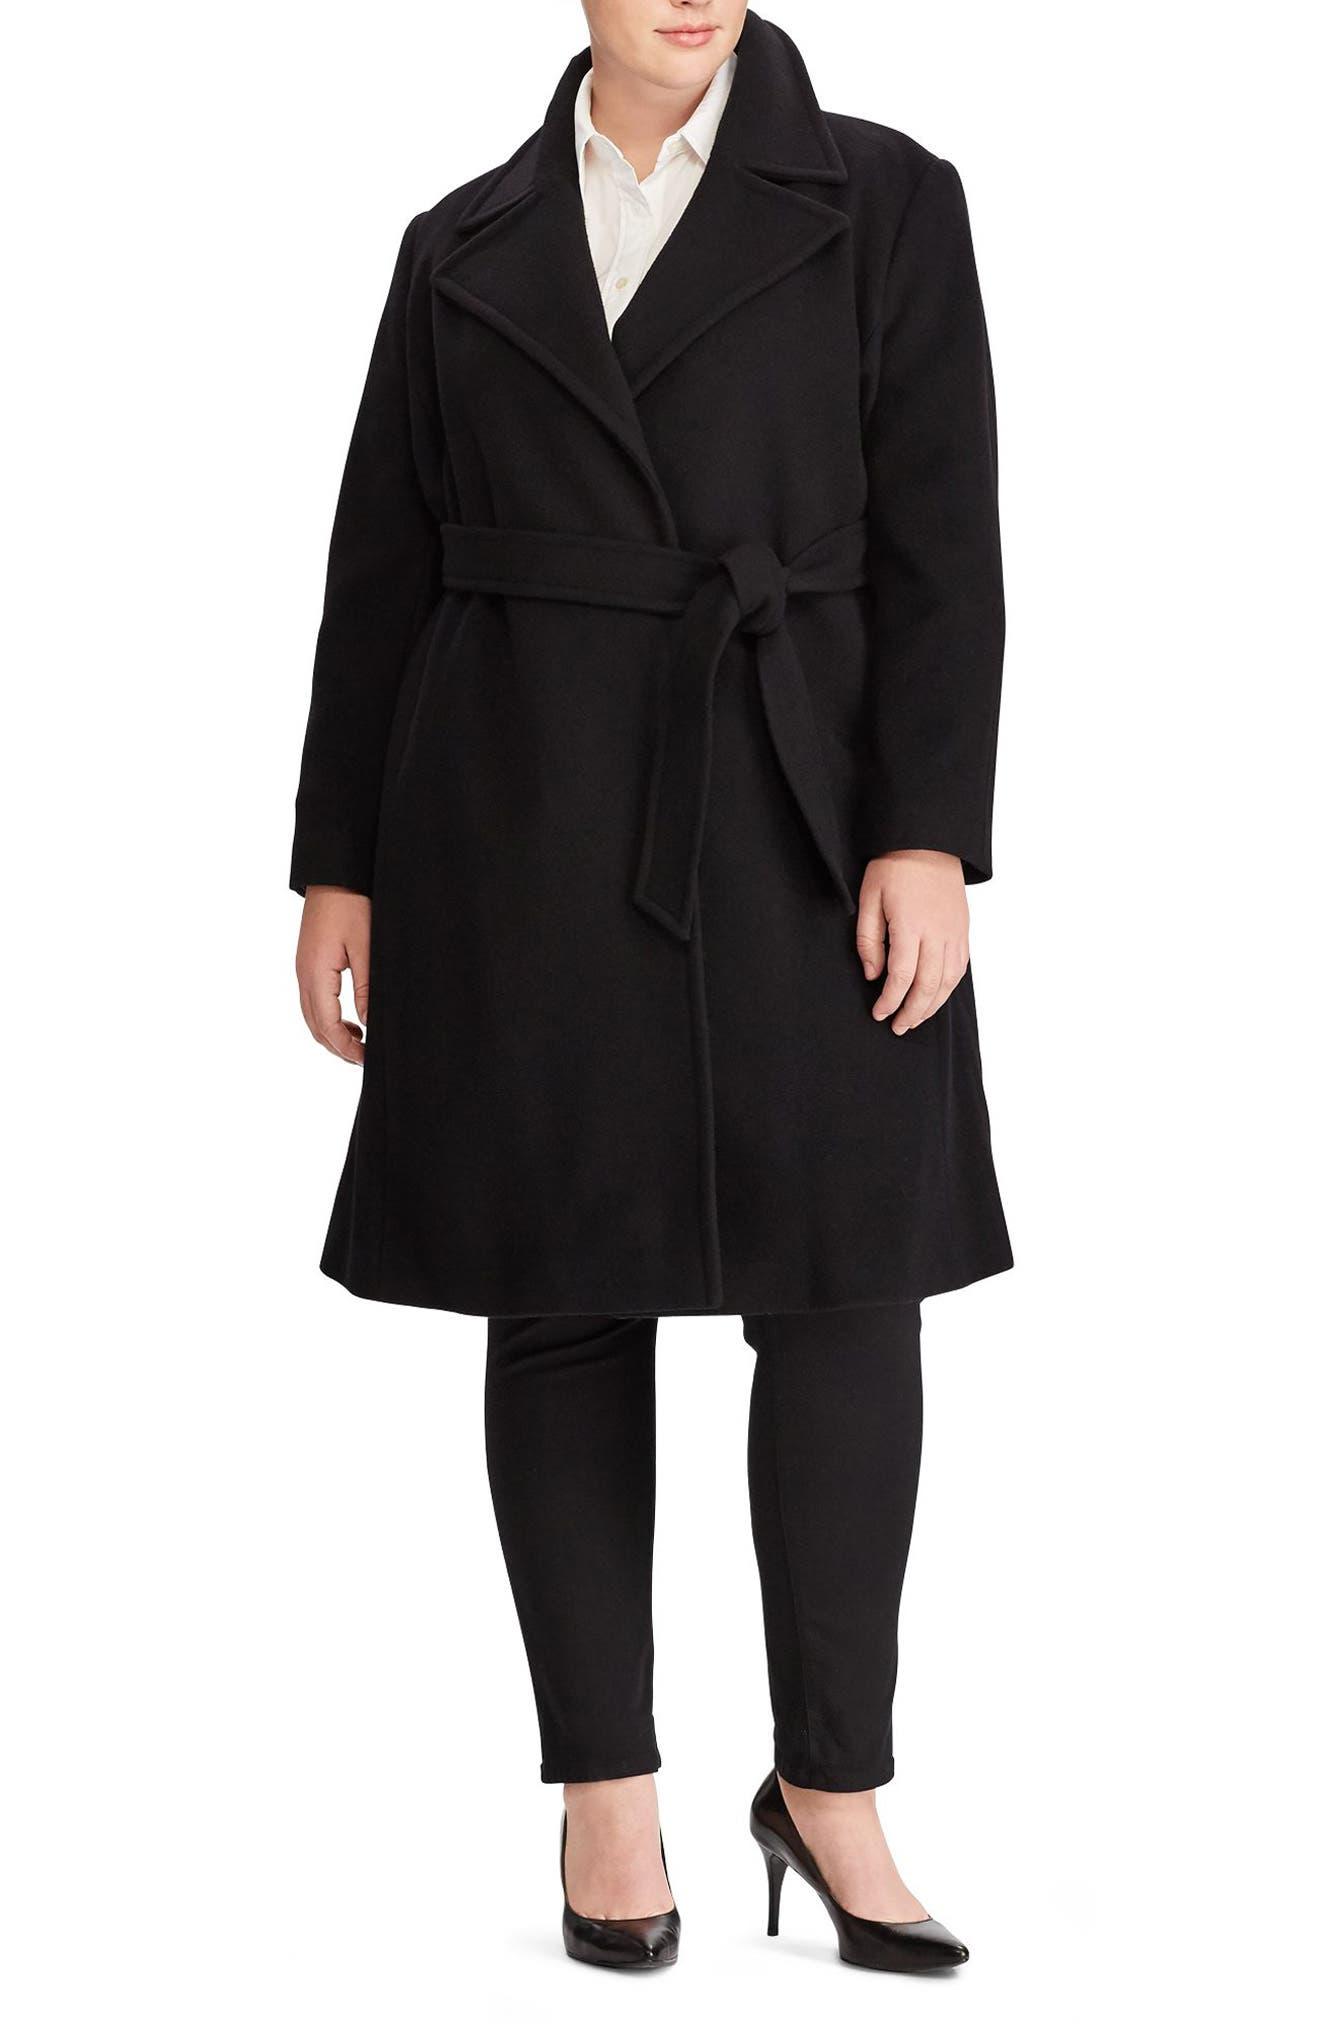 Alternate Image 1 Selected - Lauren Ralph Lauren Wool Blend Wrap Coat (Plus Size)